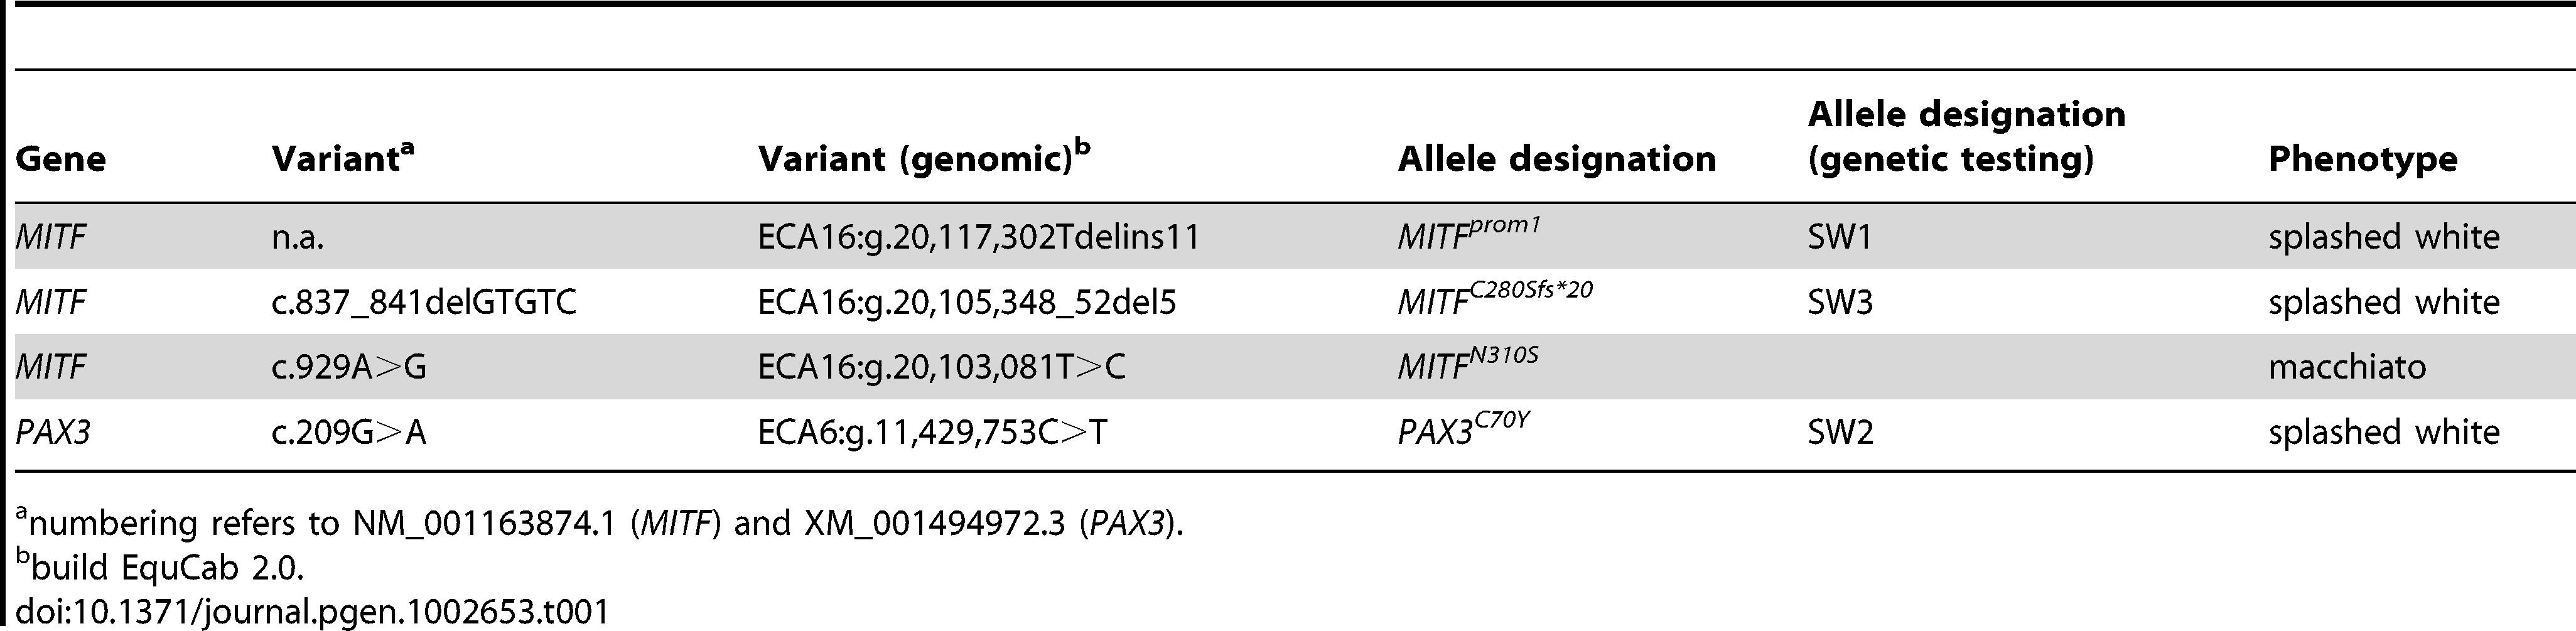 Causative mutations for white spotting phenotypes.